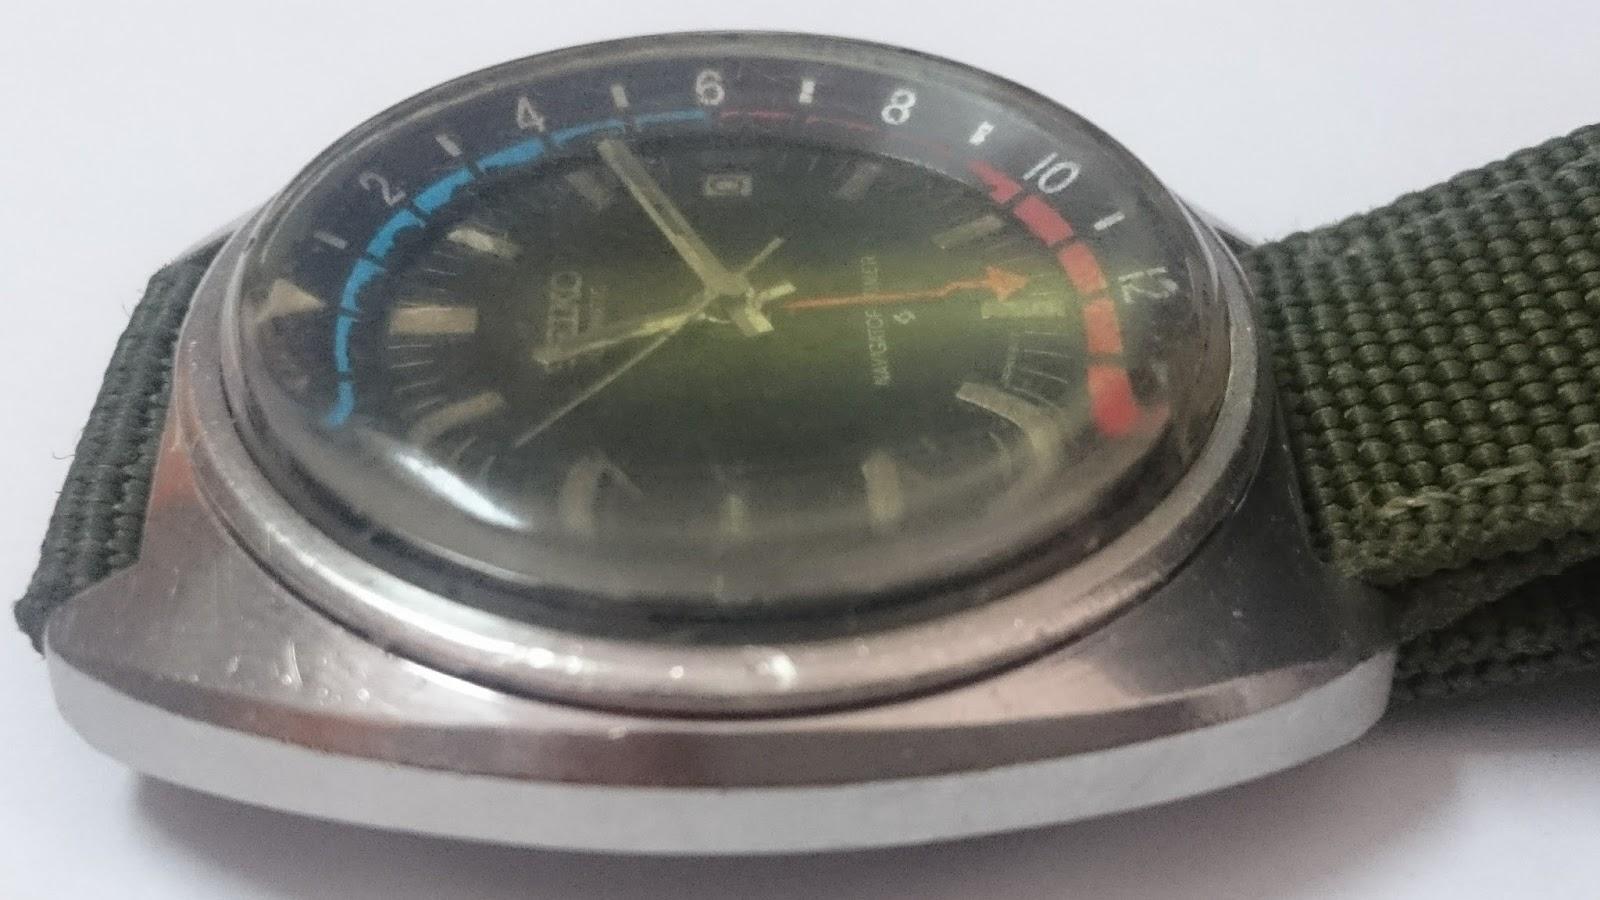 xDeath Market: (SOLD) Seiko Navigator Timer Ref. 6117-6410